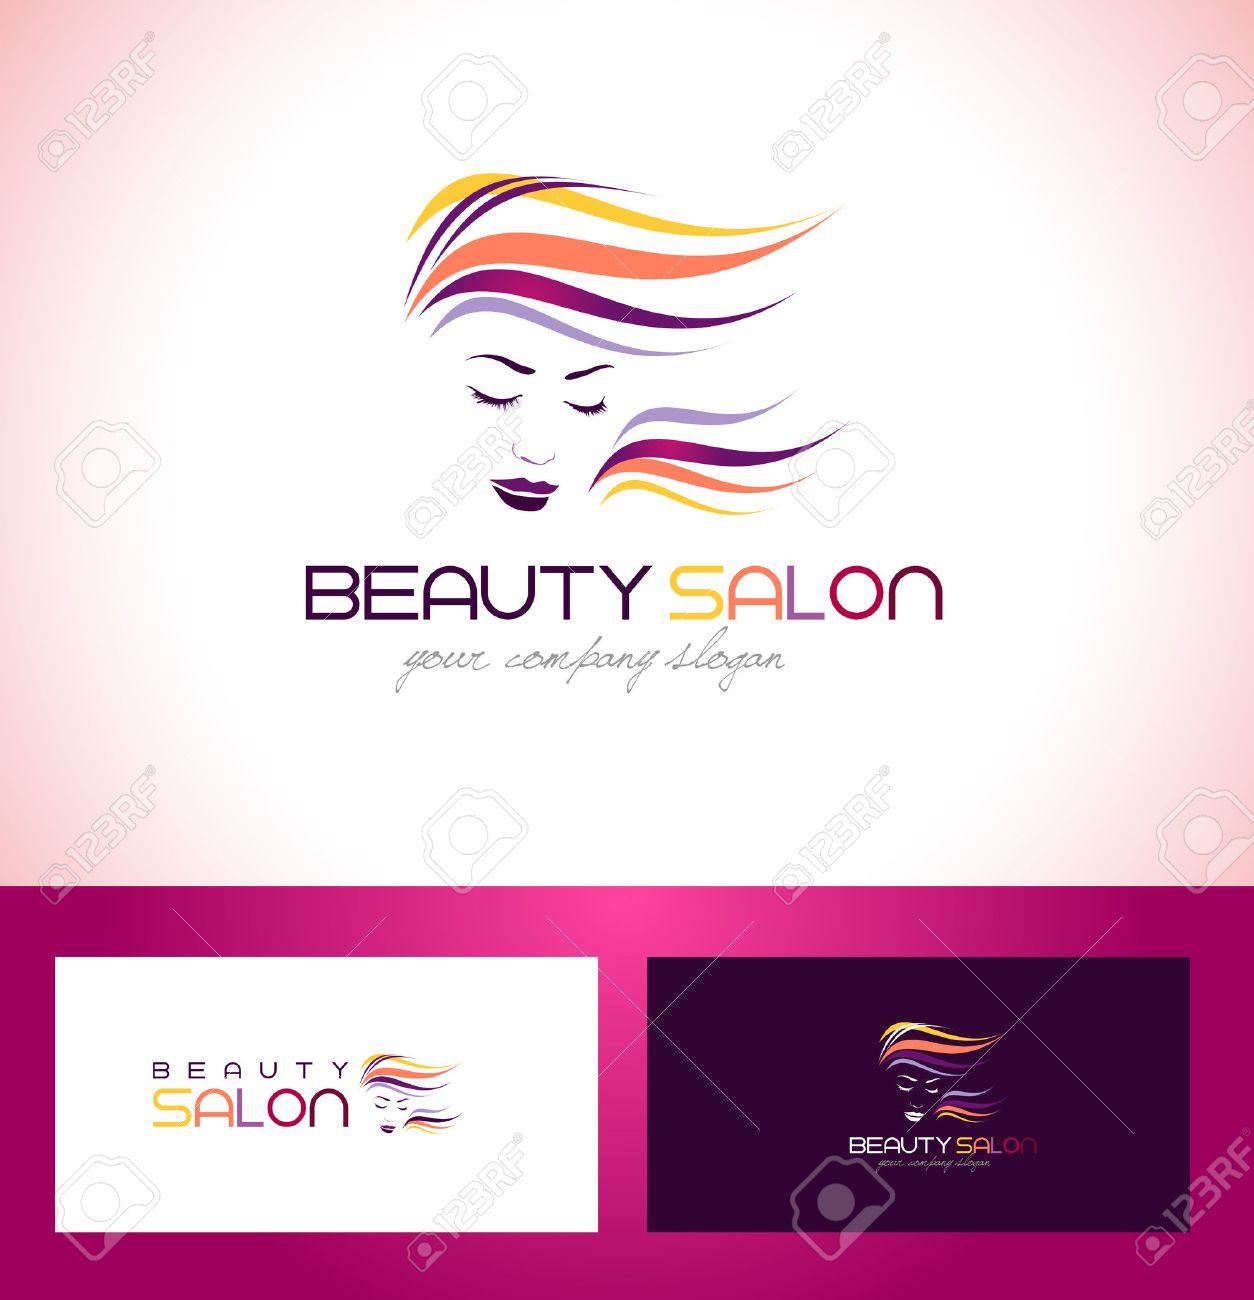 Beauty Female Face Logo Design Cosmetic Salon Logo Design Creative Royalty Free Cliparts Vectors And Stock Illustration Image 45332014